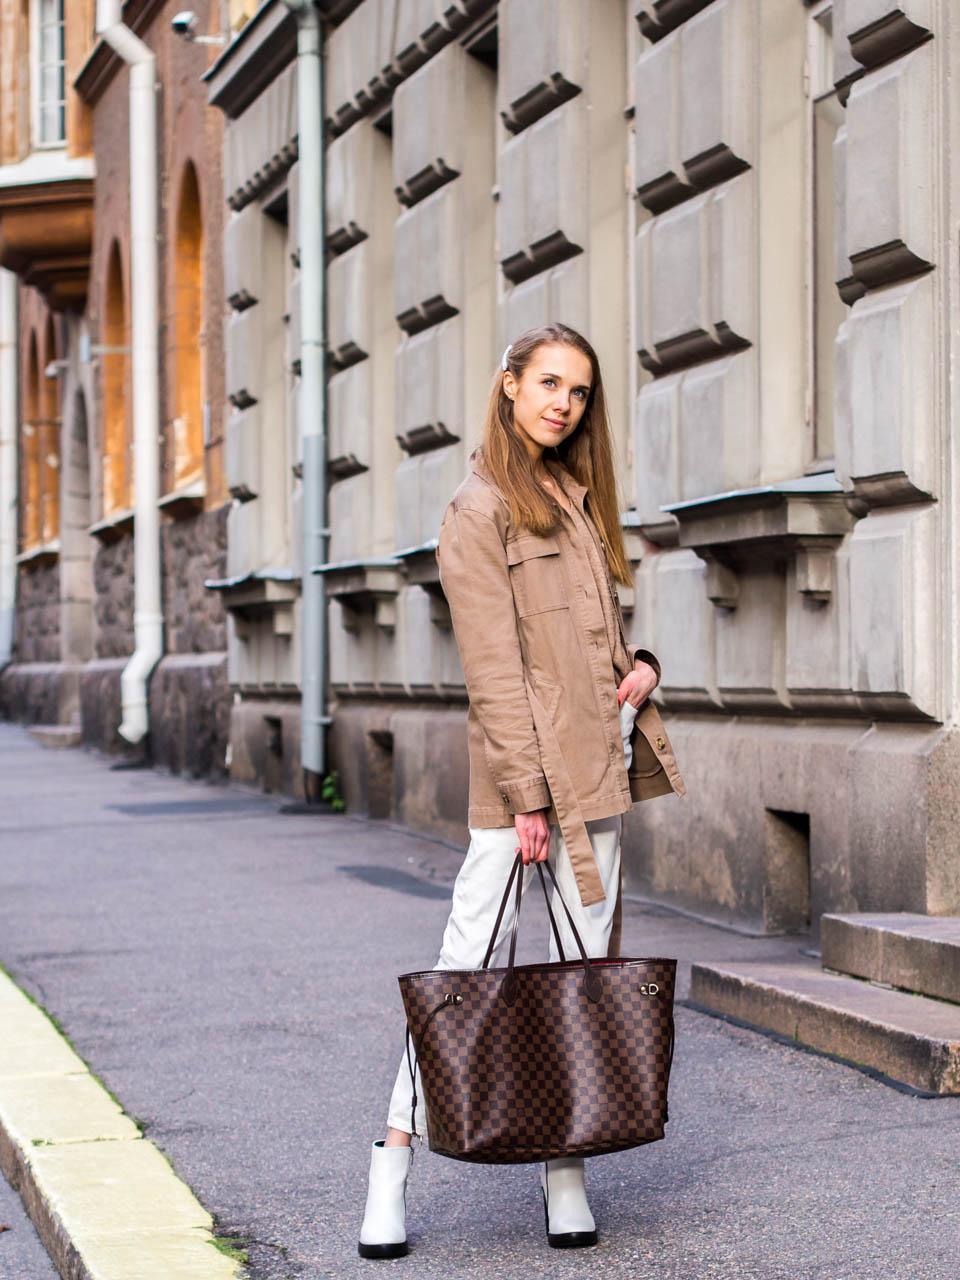 Fashion blogger autumn outfit neutral colours and white ankle boots - Muotibloggaaja syysmuoti-inspiraatio ja valkoiset nilkkurit